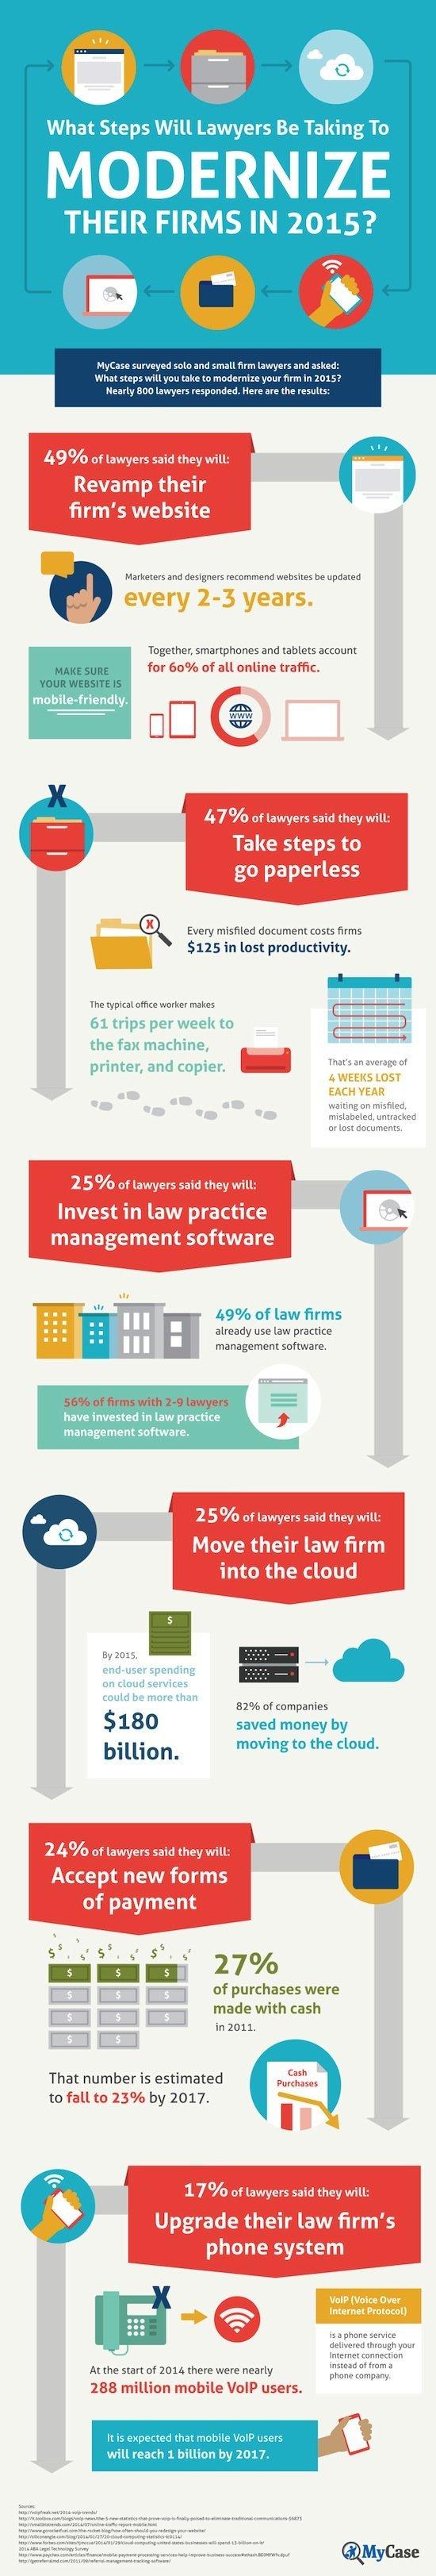 Modernize-Law-Firm-FINAL